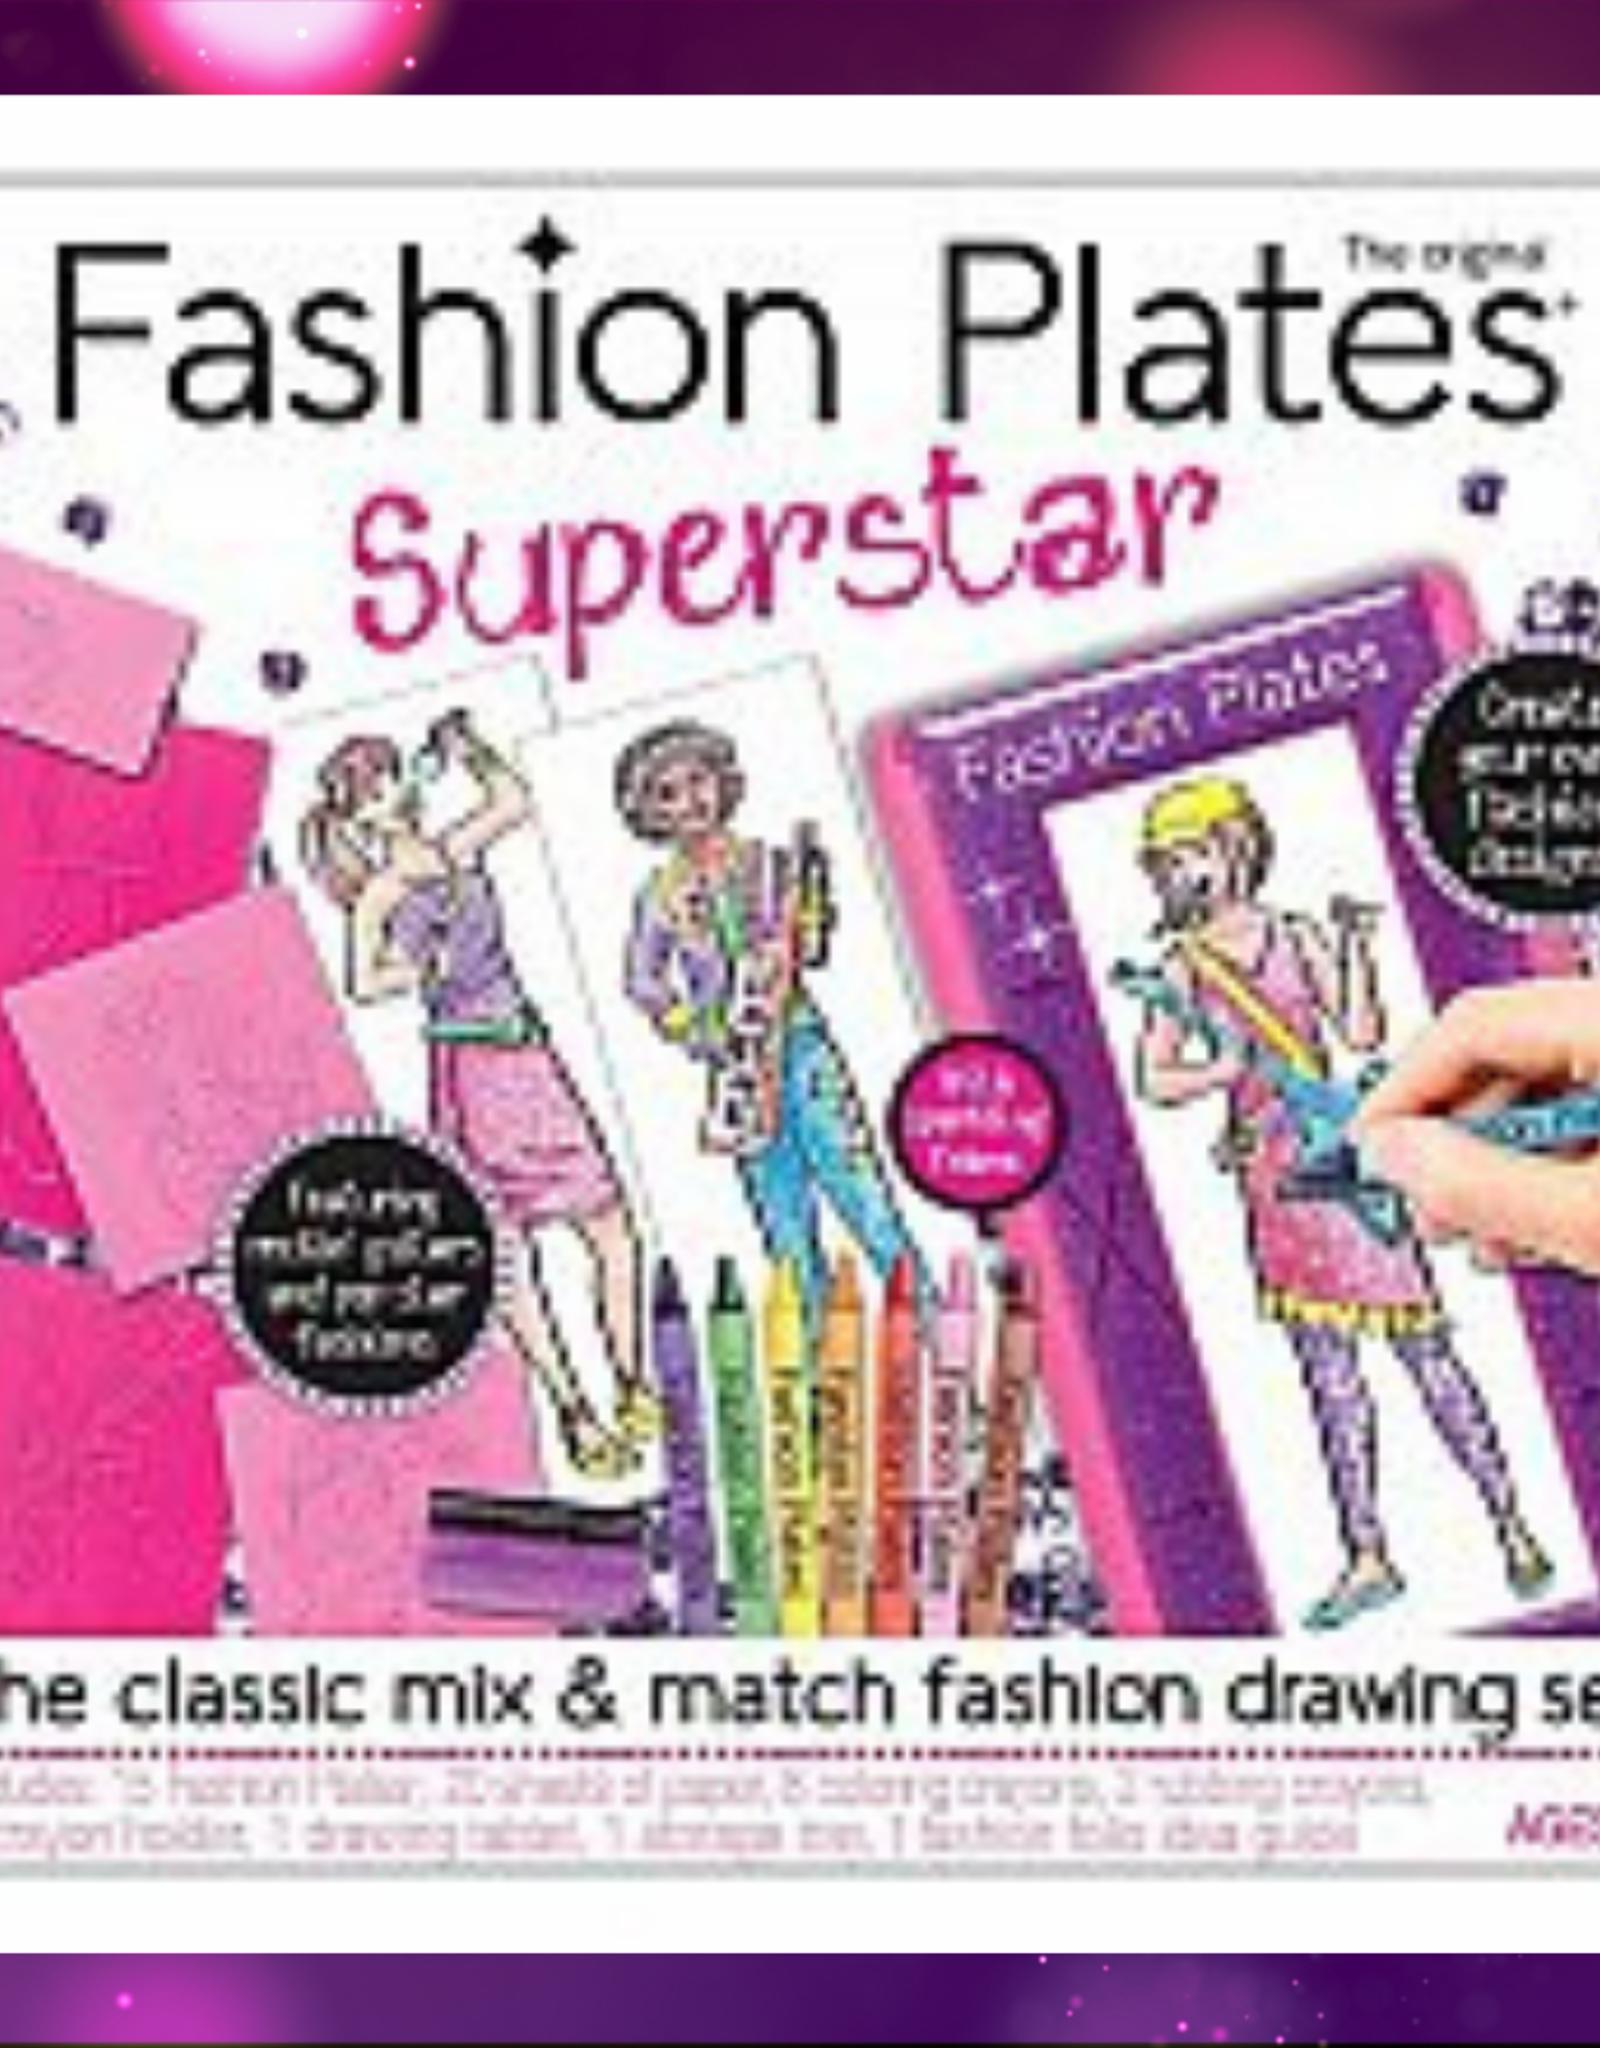 FASHION PLATES SUPER STAR